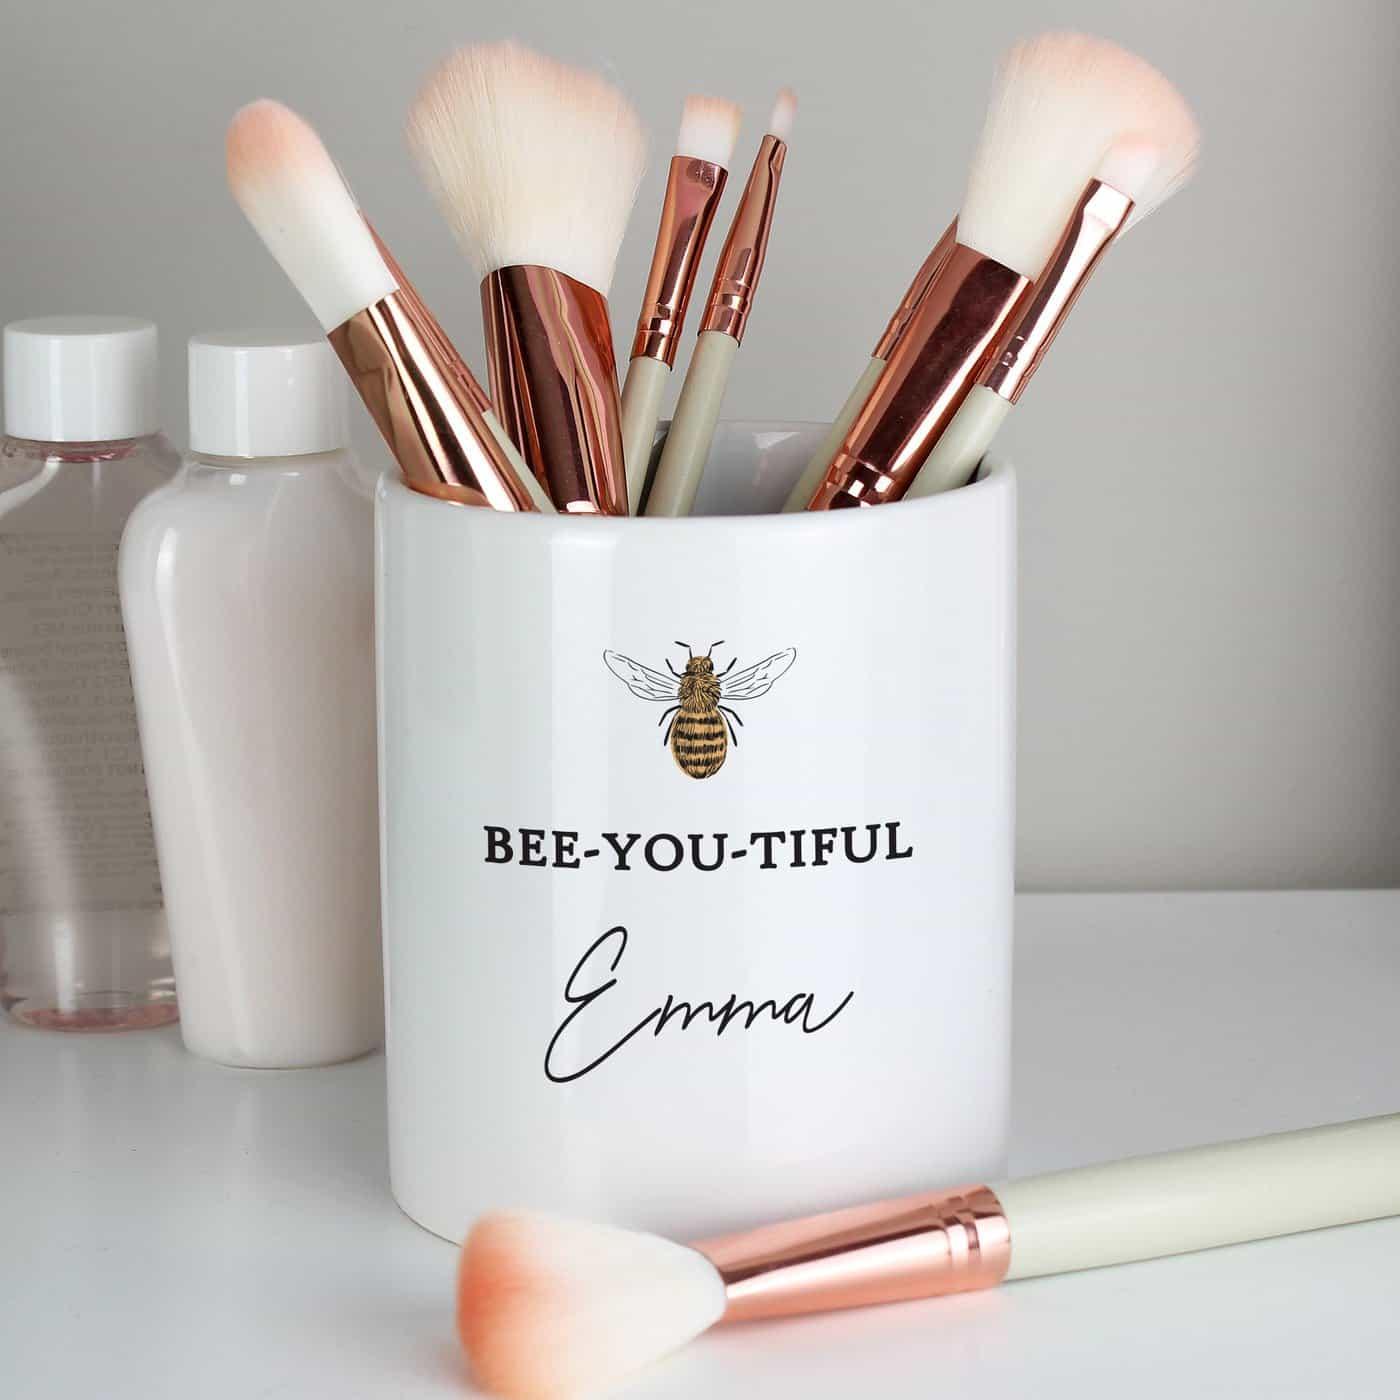 Personalised Bee-u-tiful Ceramic Storage Pot